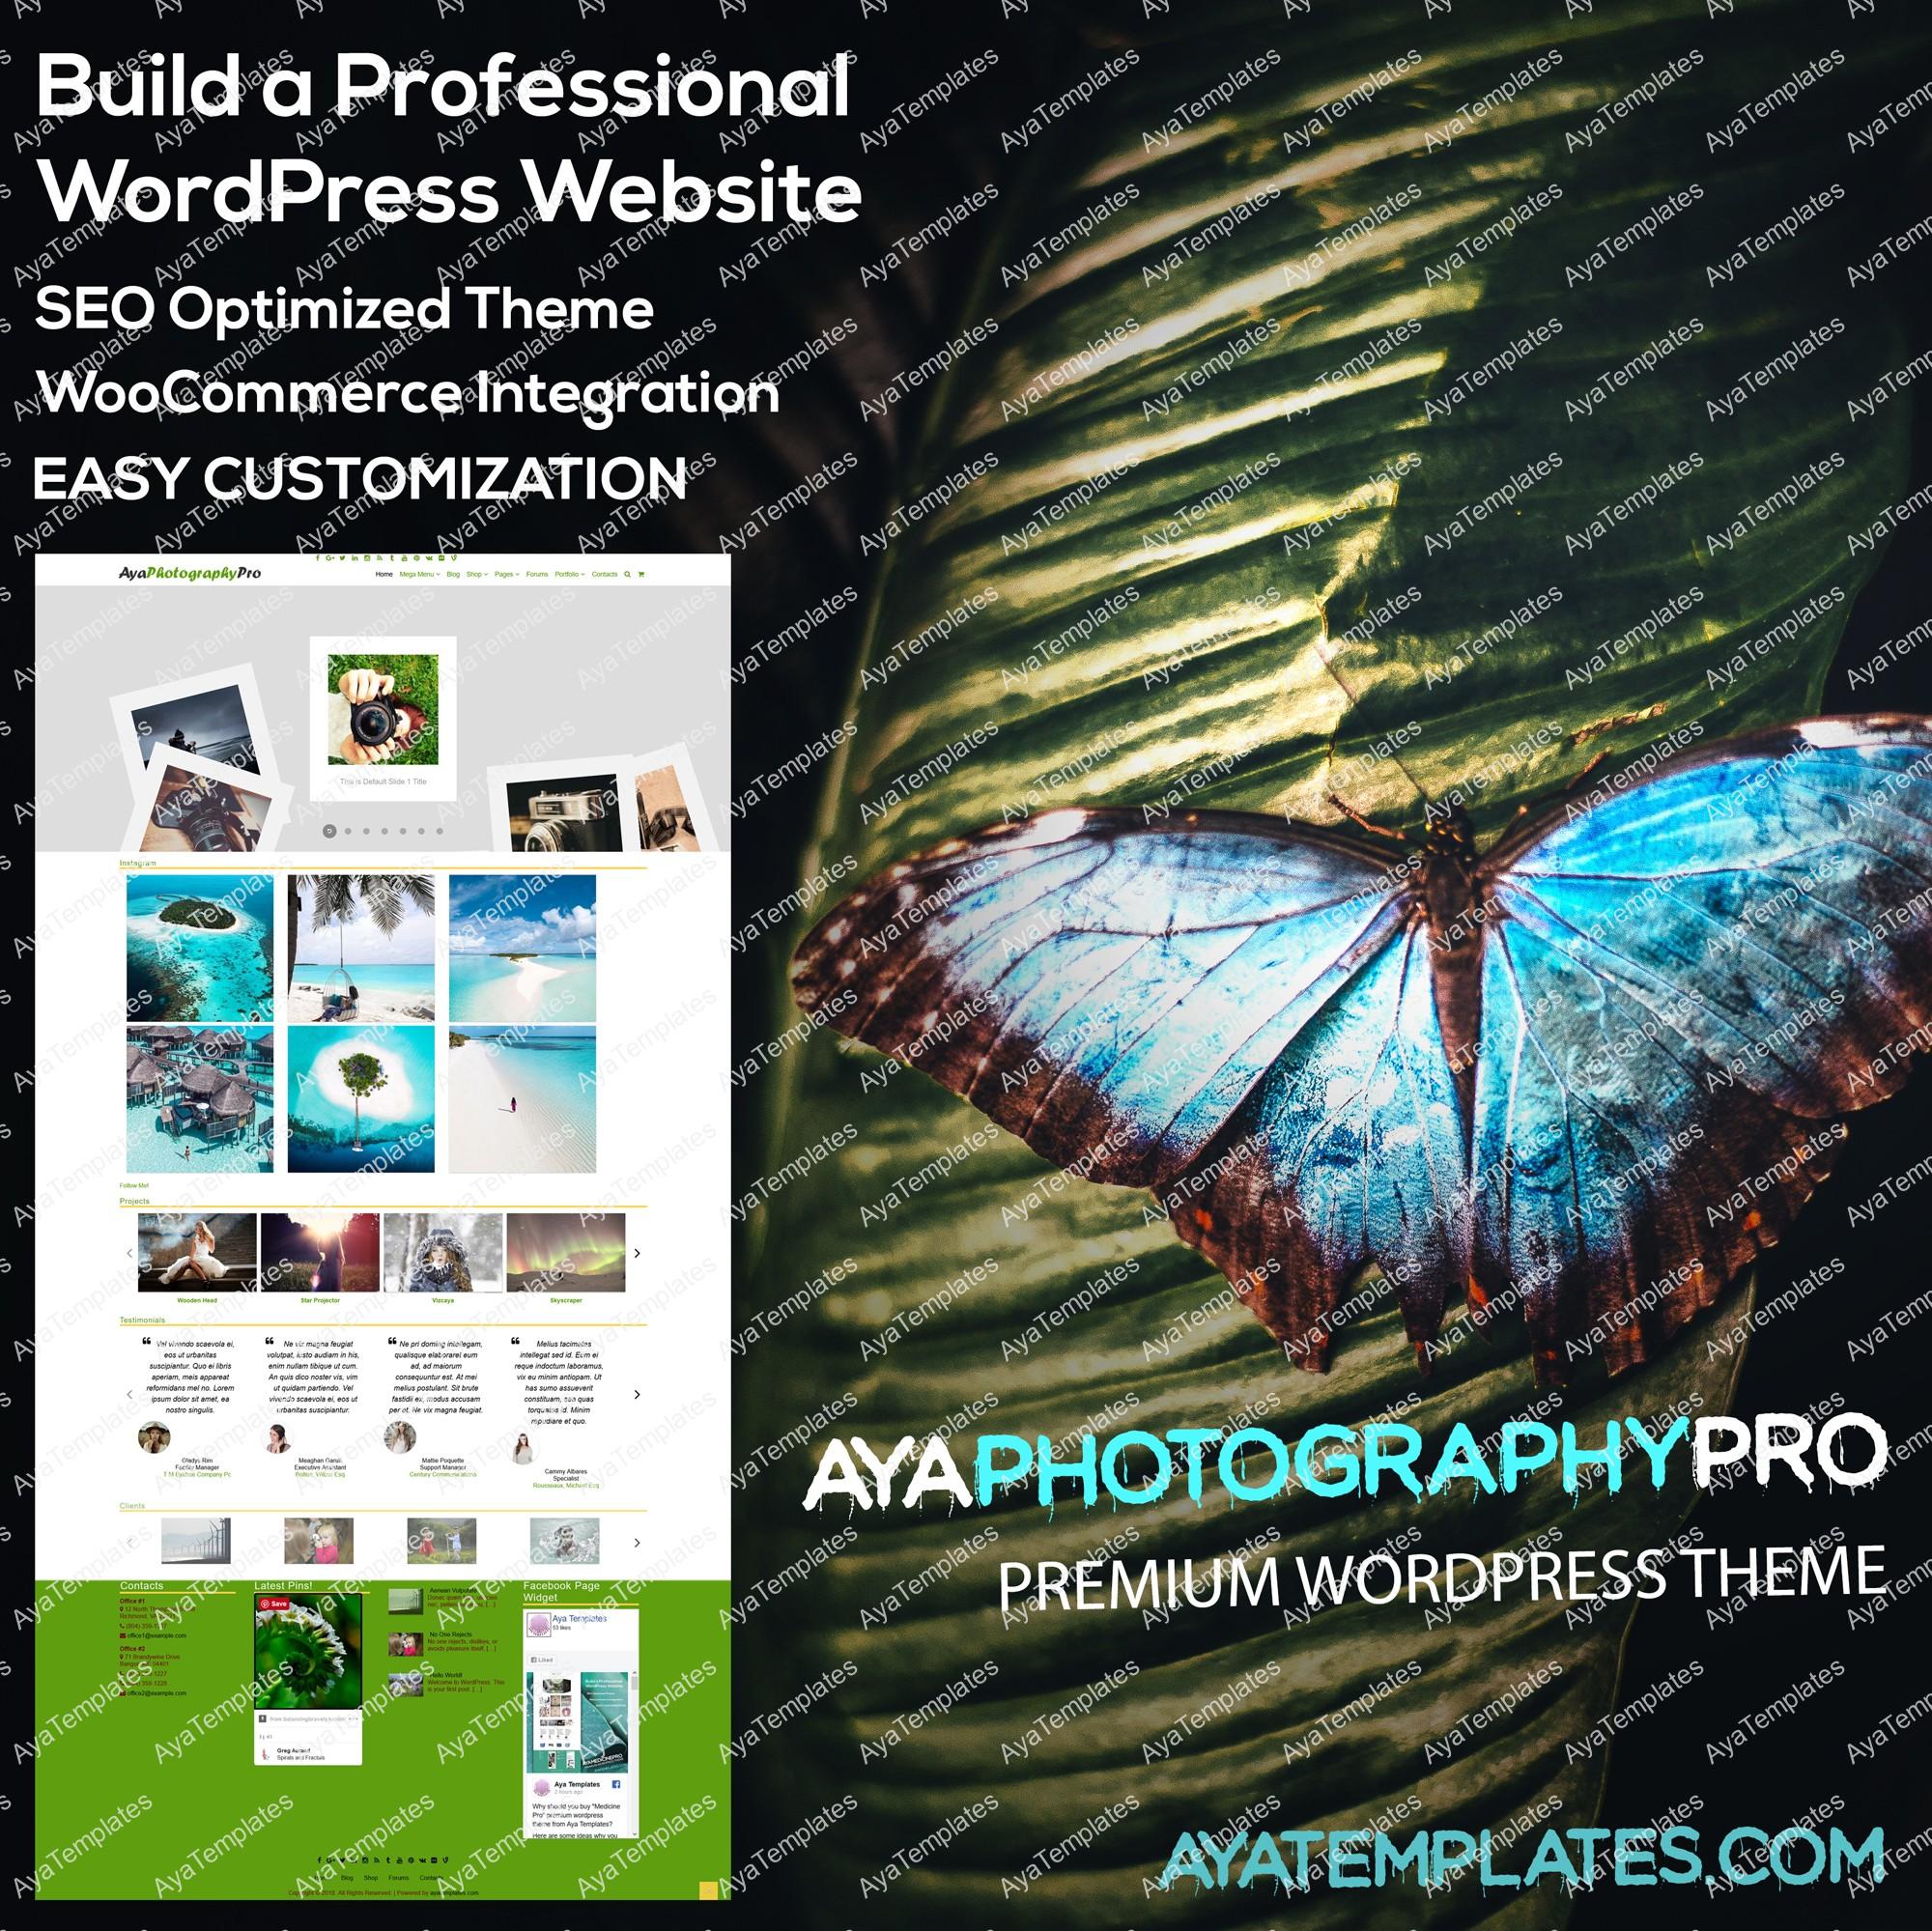 AyaPhotographyPro-premium-wordpress-theme-mockup-ayatemplates